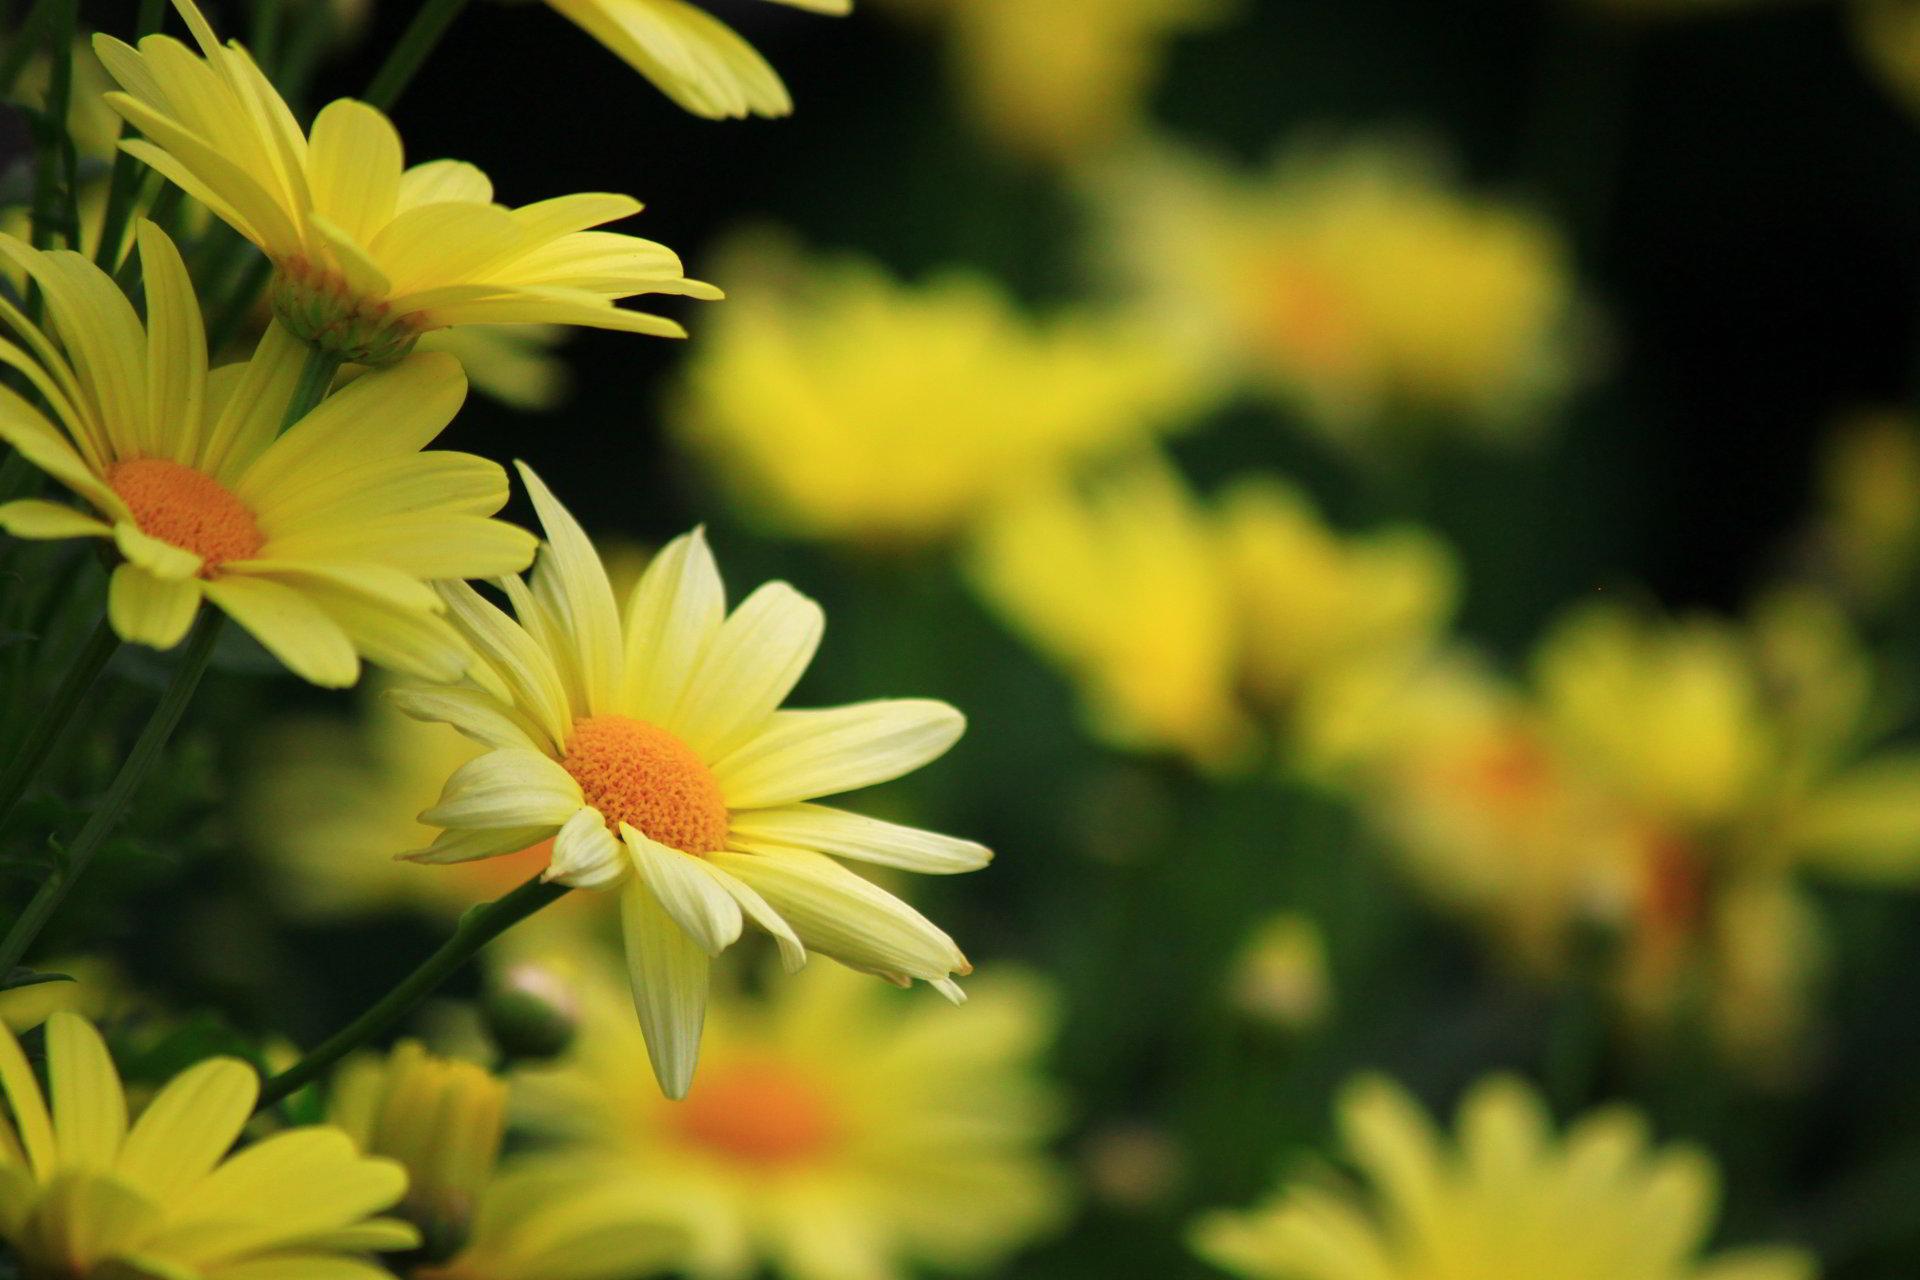 hinh anh hoa cuc dep 21